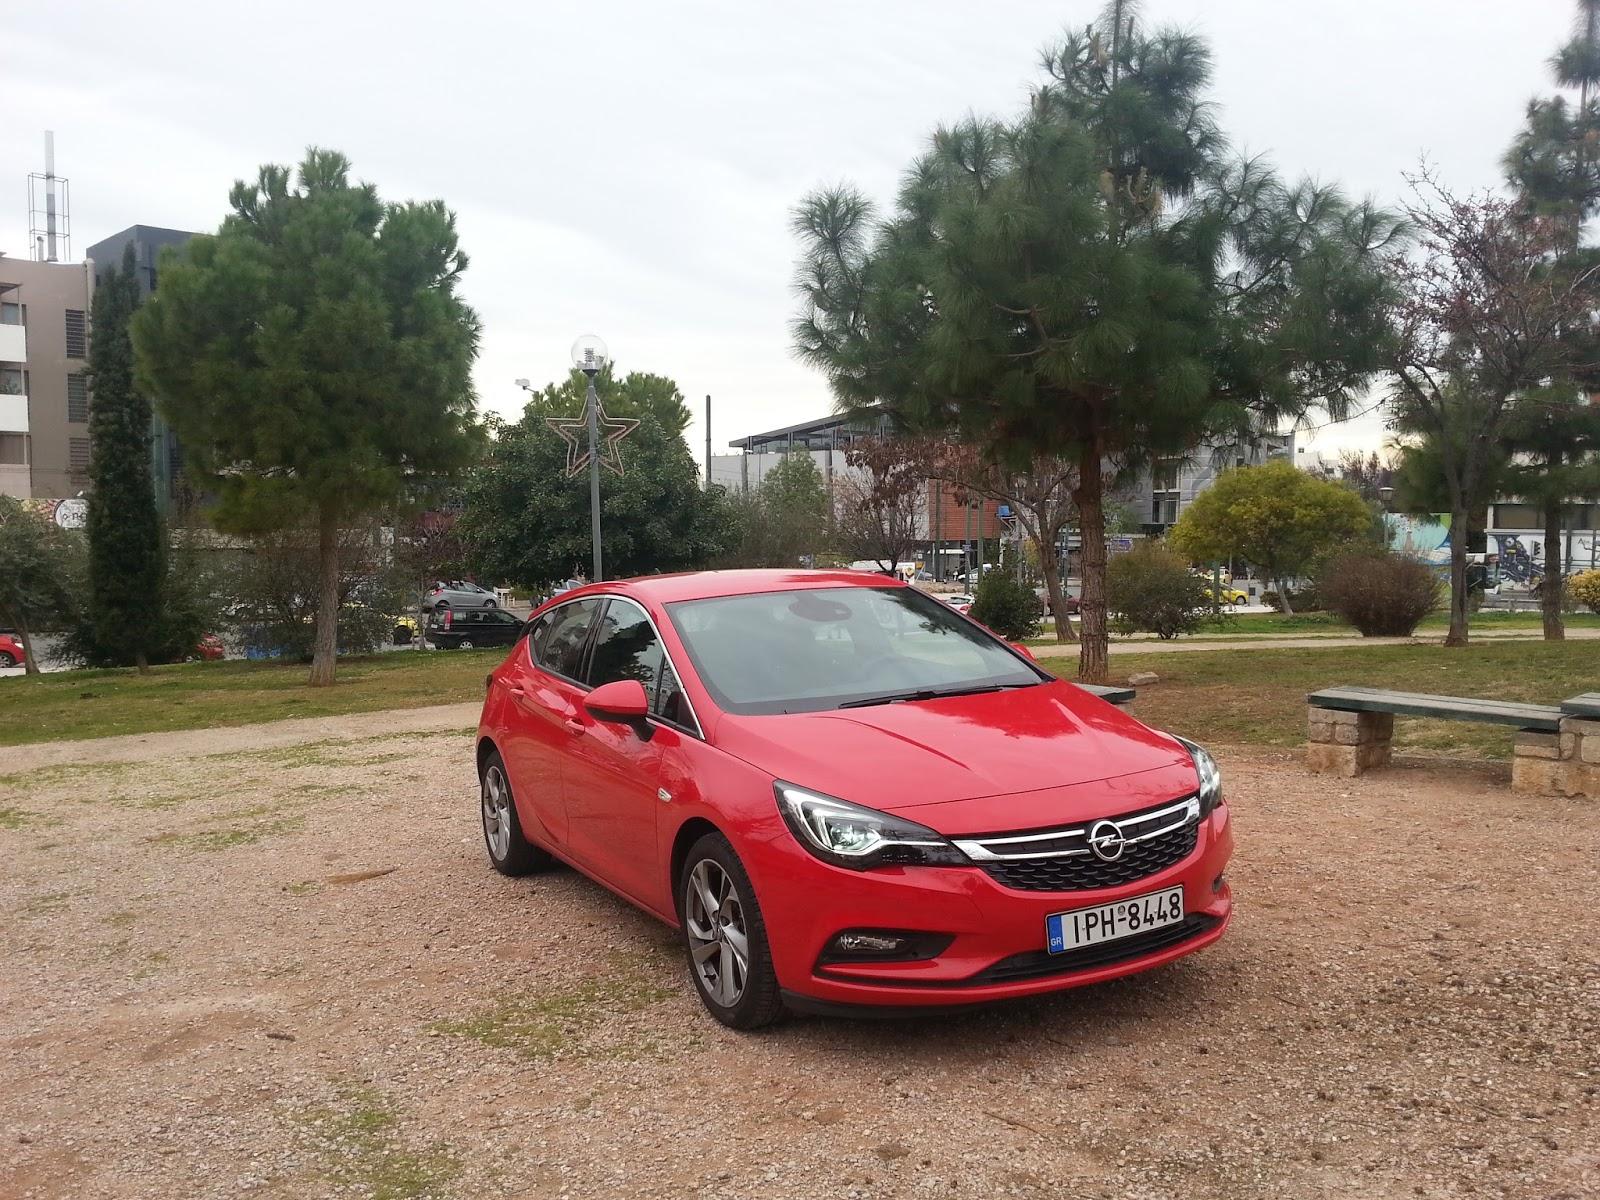 astra1 Πόσο αστέρι είναι, τελικά, το νέο Astra; Diesel, Opel, Opel Astra, TEST, zblog, ΔΟΚΙΜΕΣ, οδηγούμε